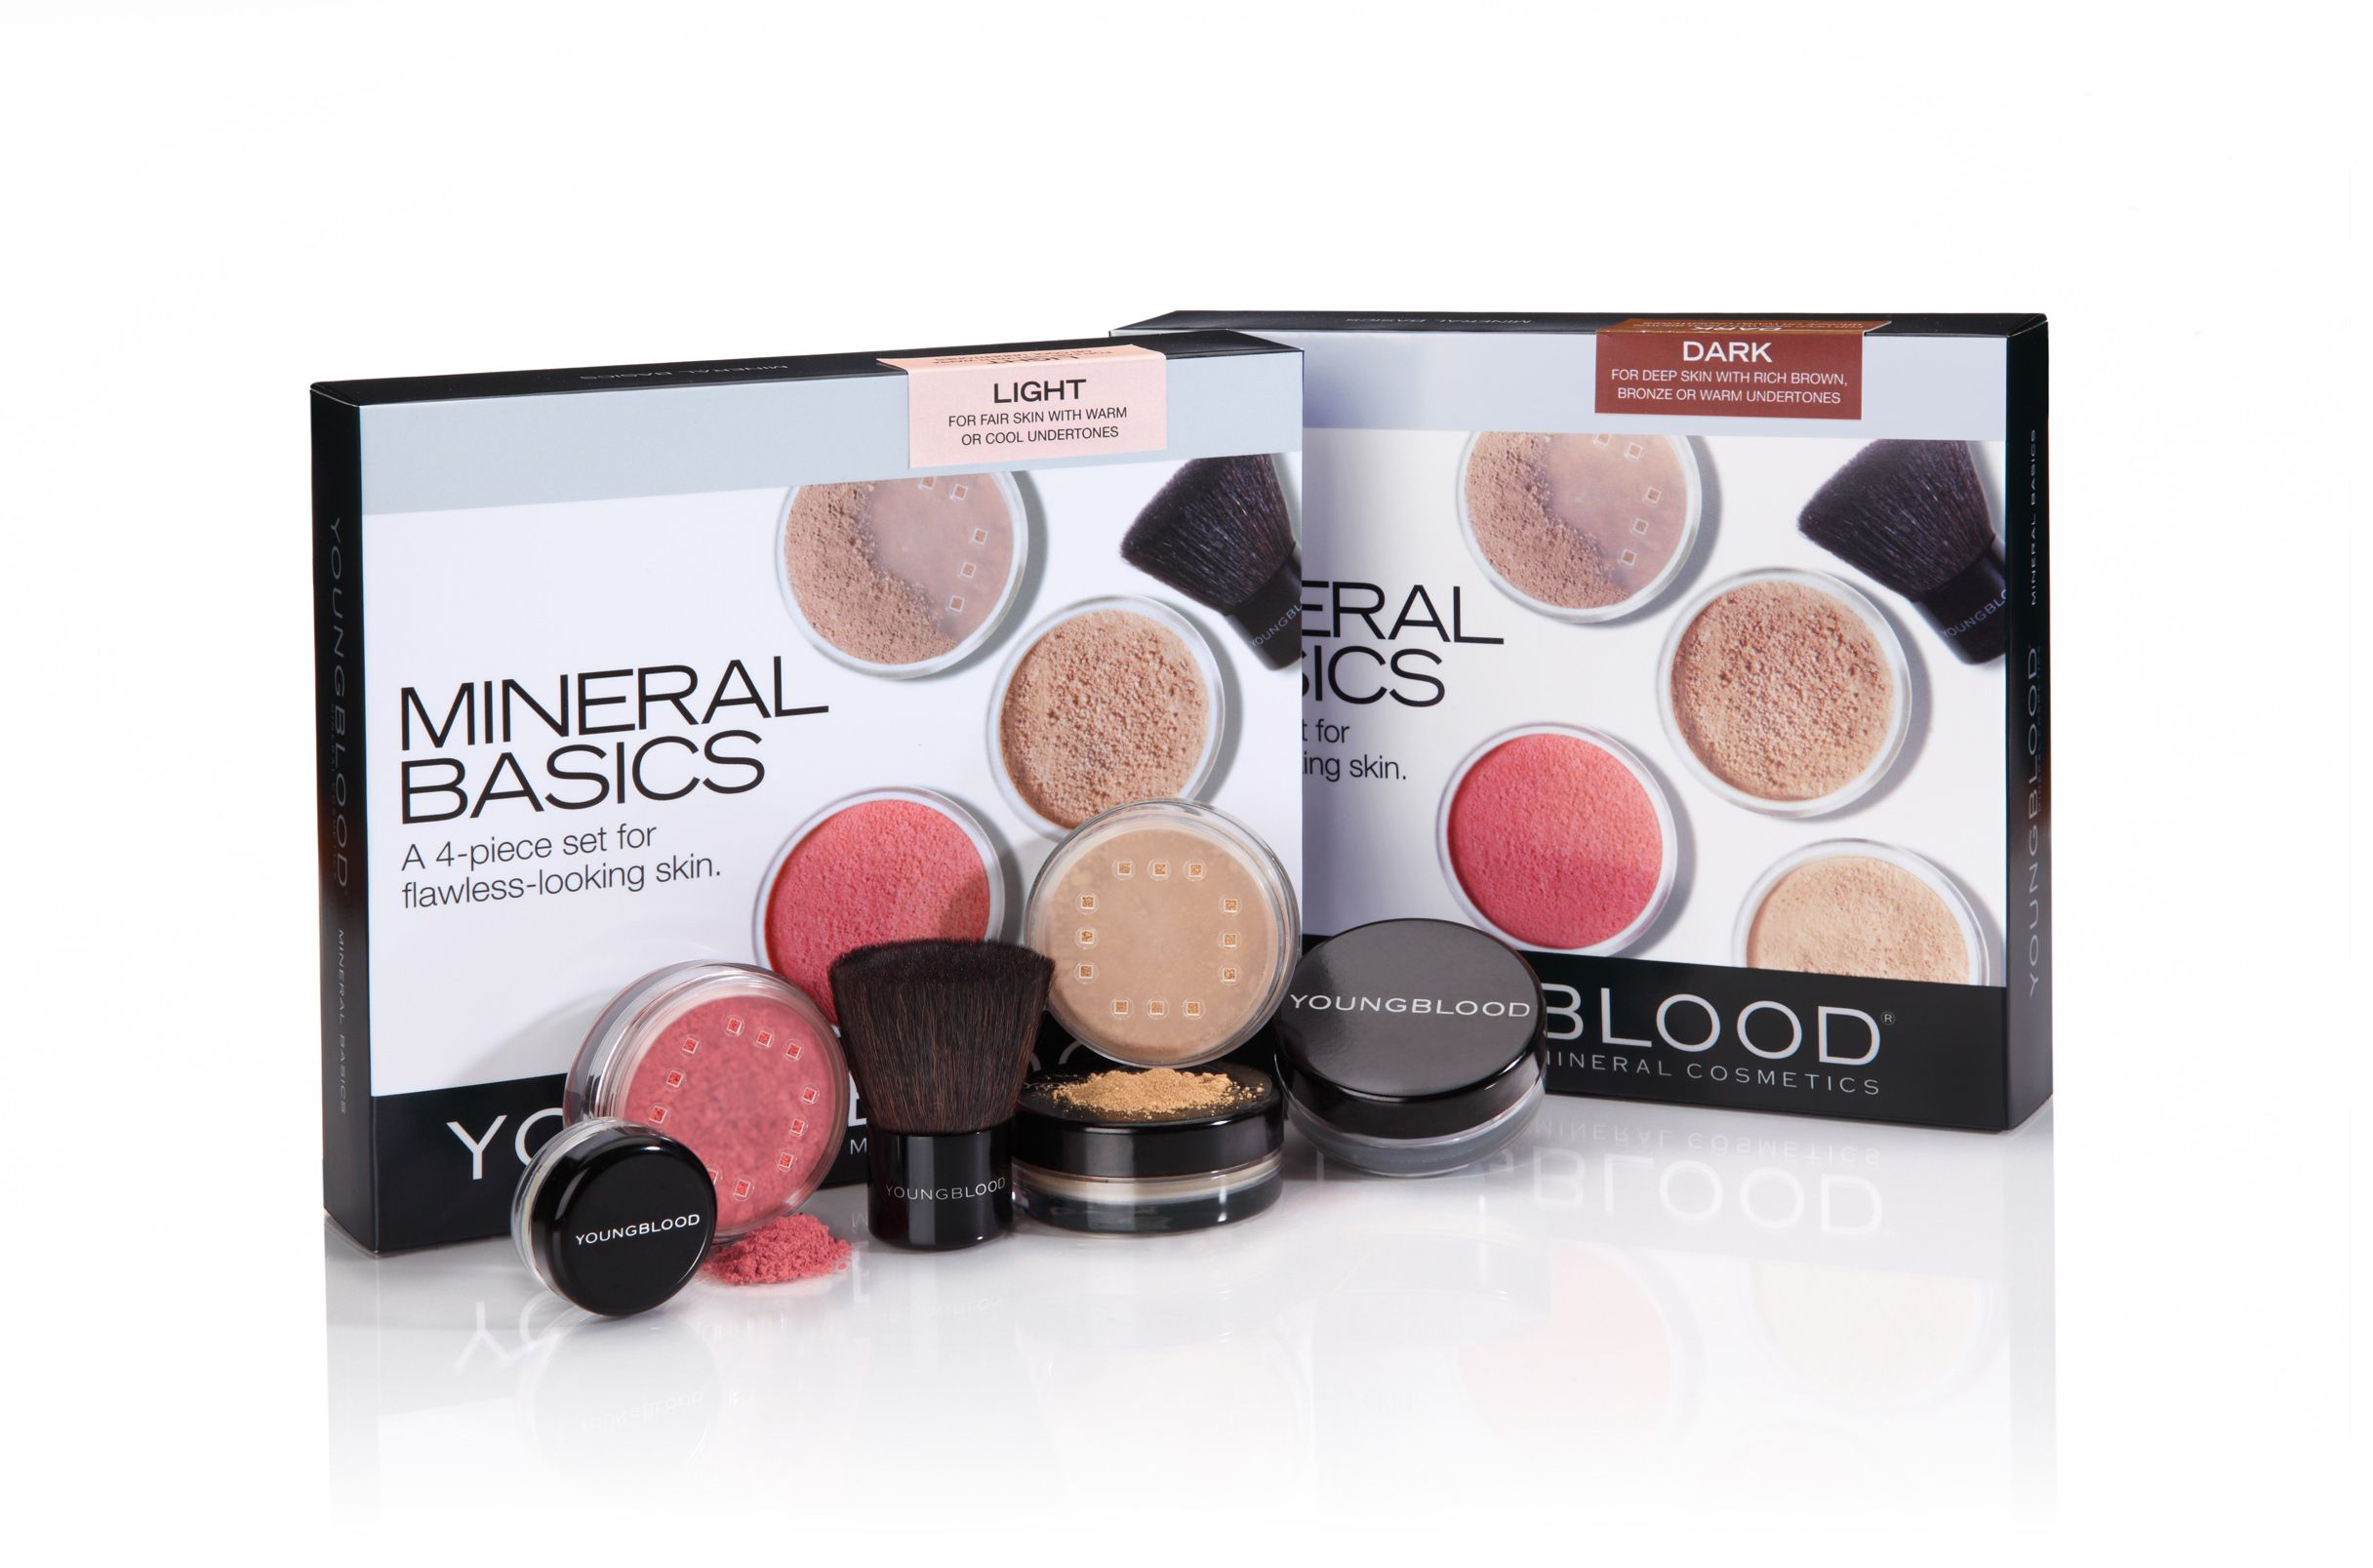 Mini Basics Youngblood mineral cosmetics, Foundation kit